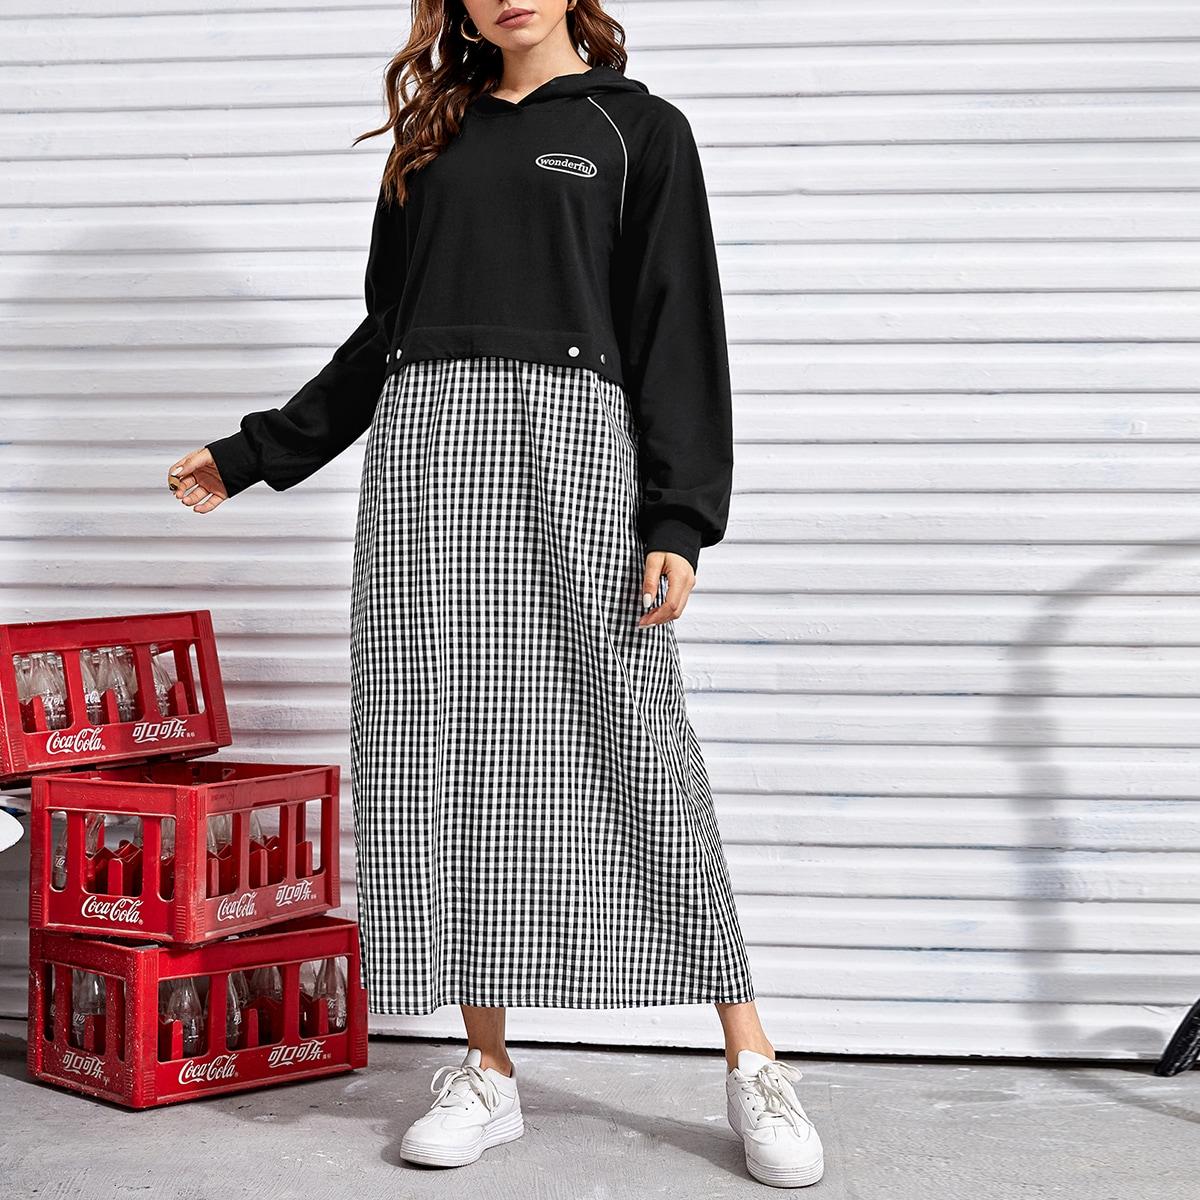 Contrast Binding Raglan Sleeve Gingham Spliced Hooded Sweatshirt Dress